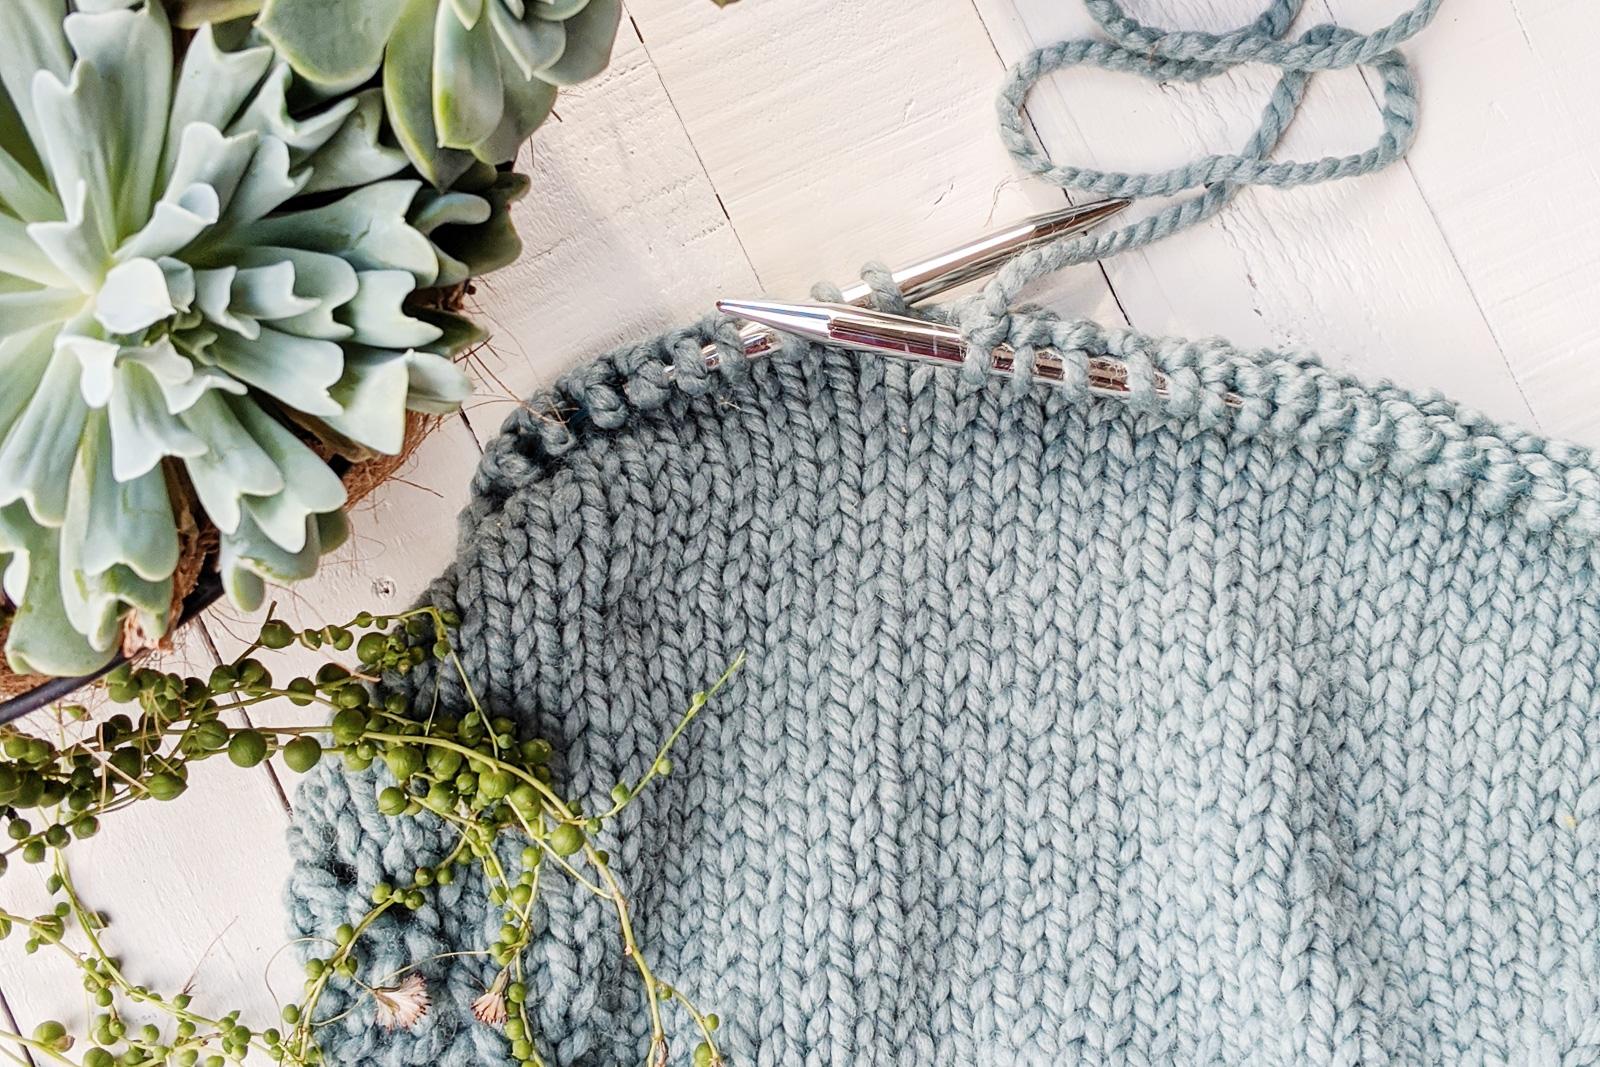 knitting stockinette stitch succulent